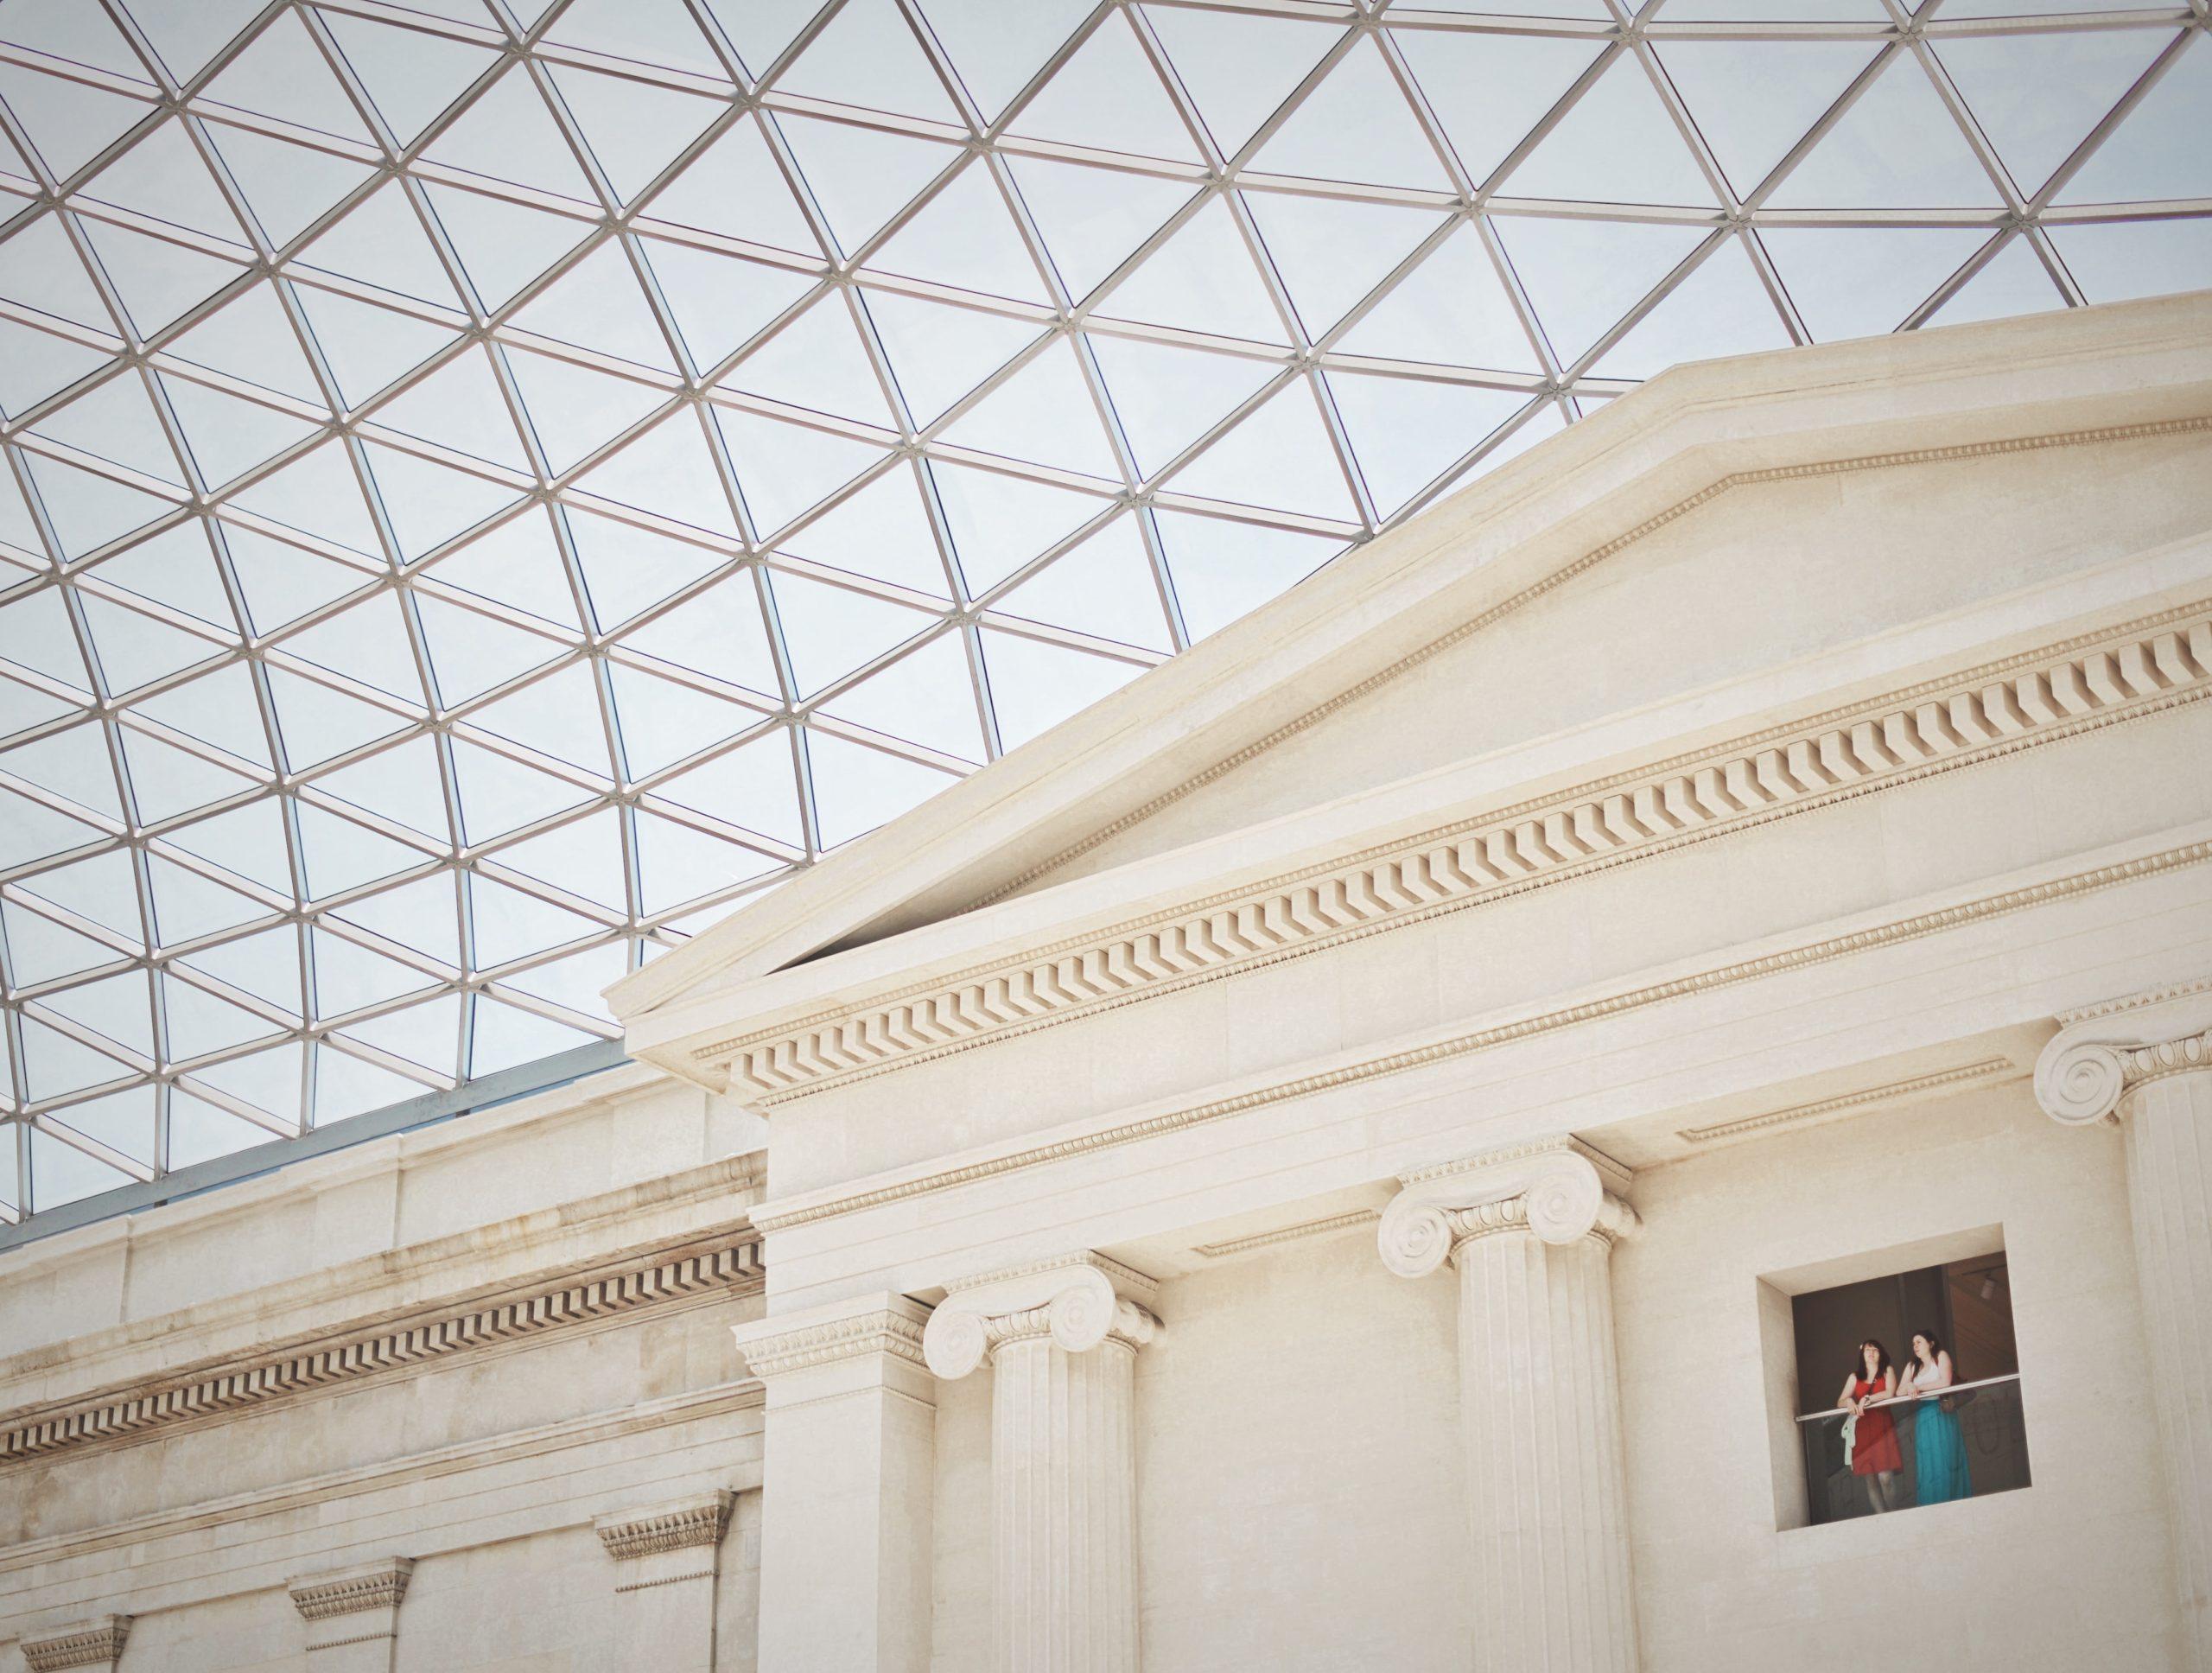 The British Museum virtual tour